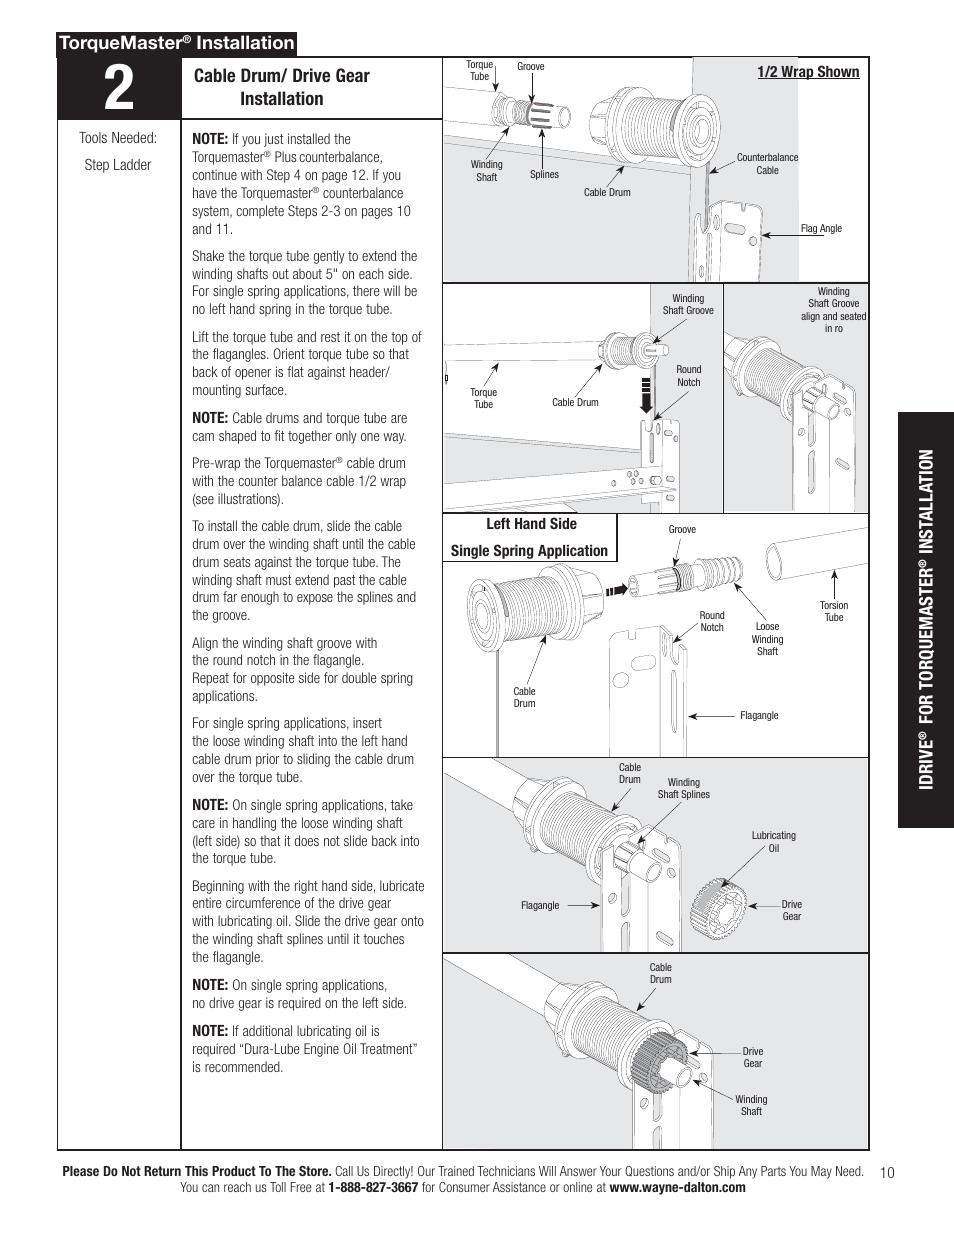 Wayne Dalton Clic Drive Wiring Diagram on